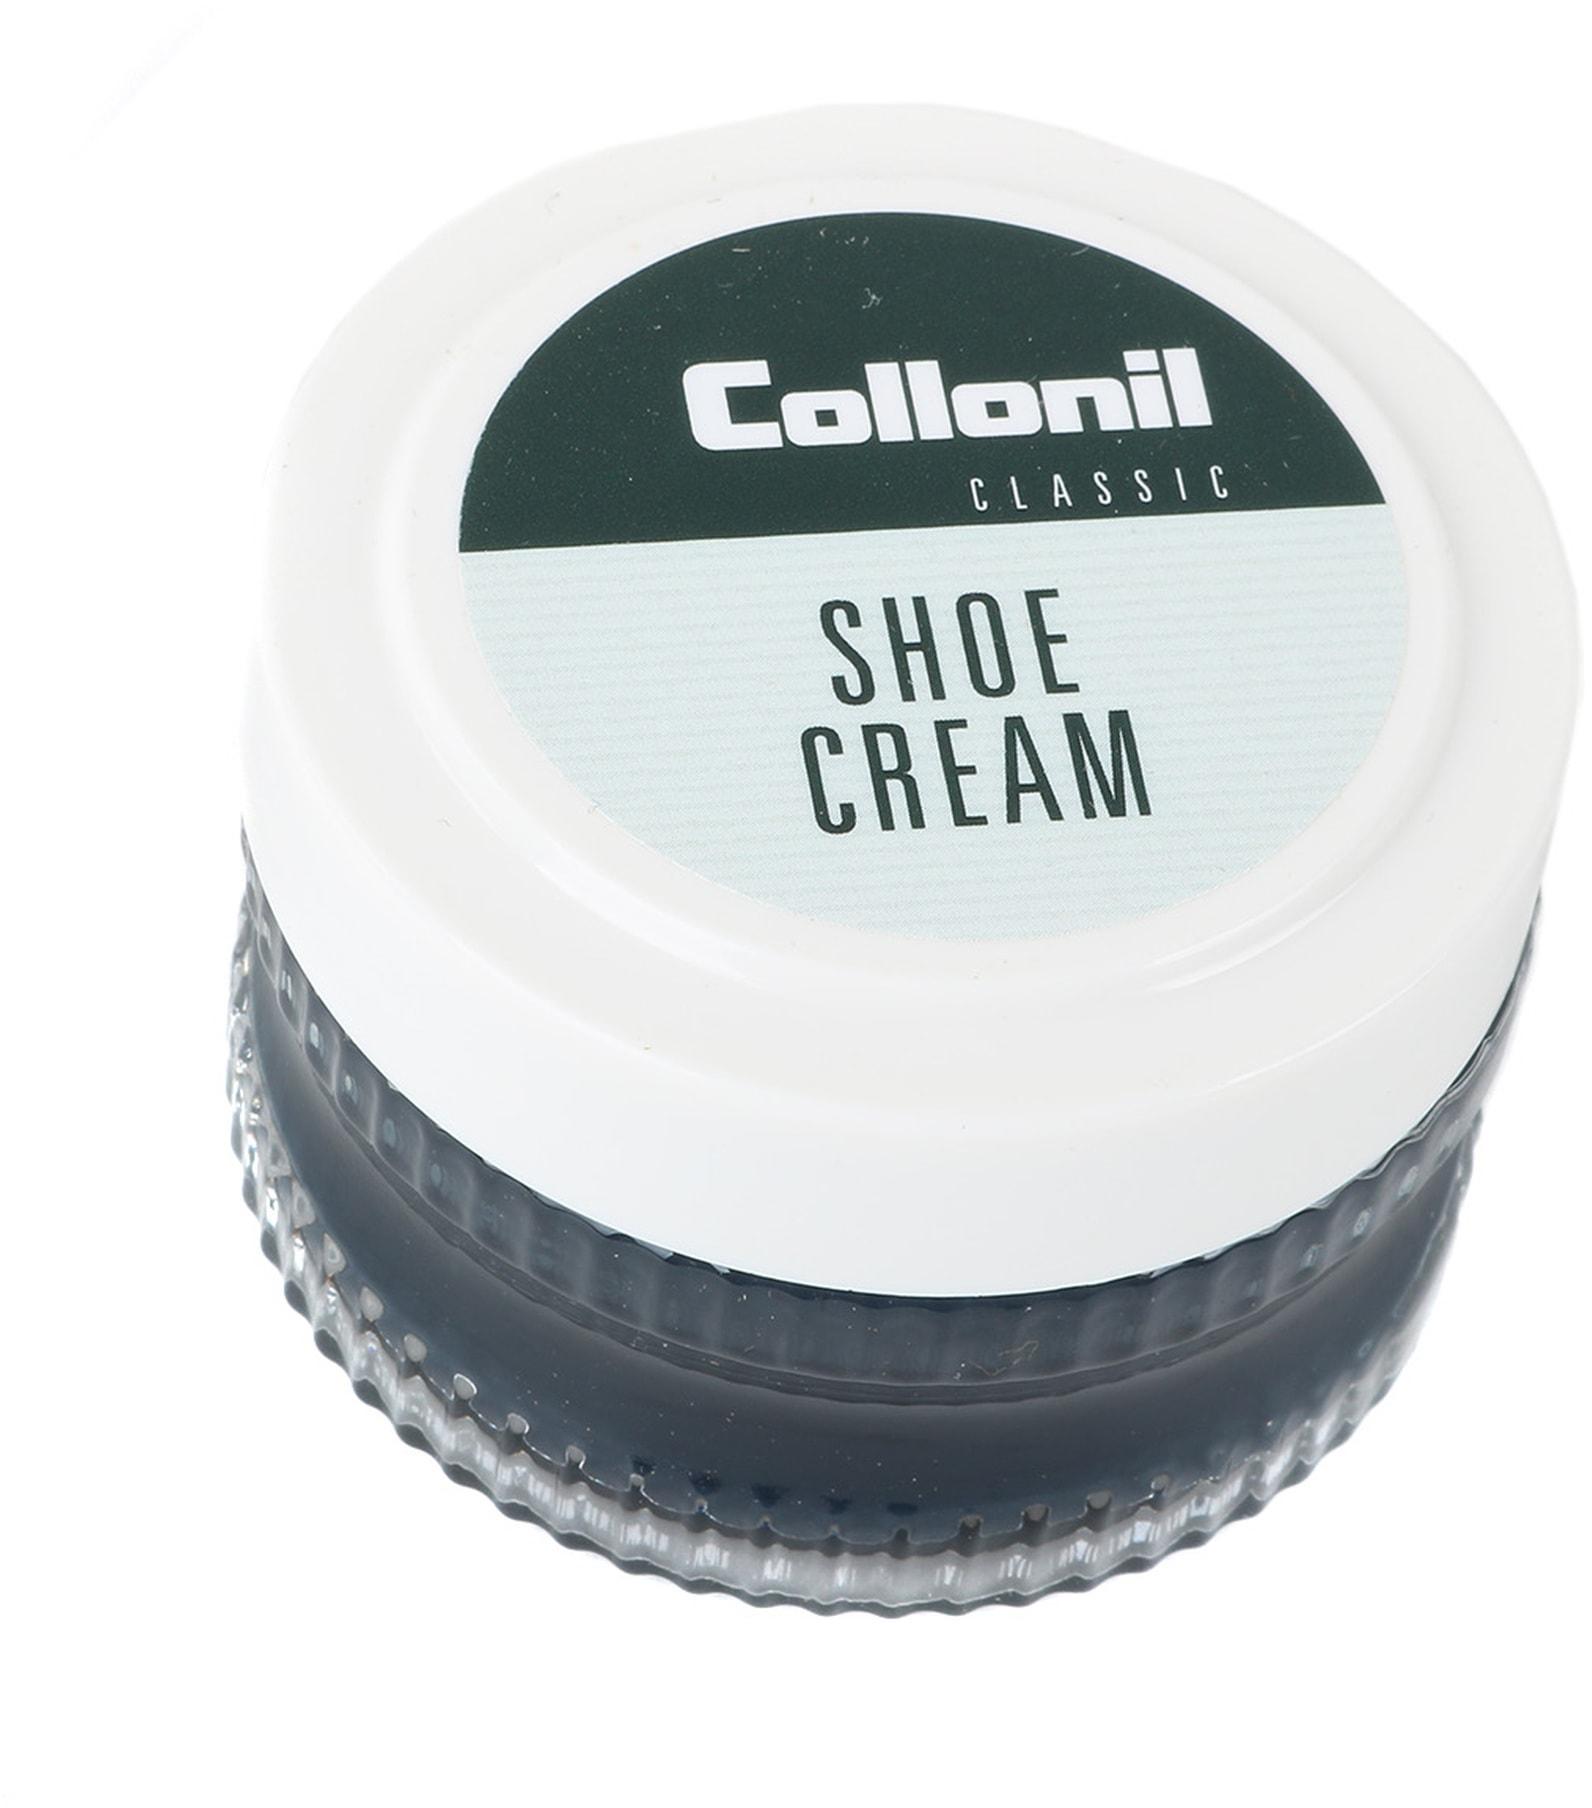 Collonil Shoe Cream Donkerblauw foto 0